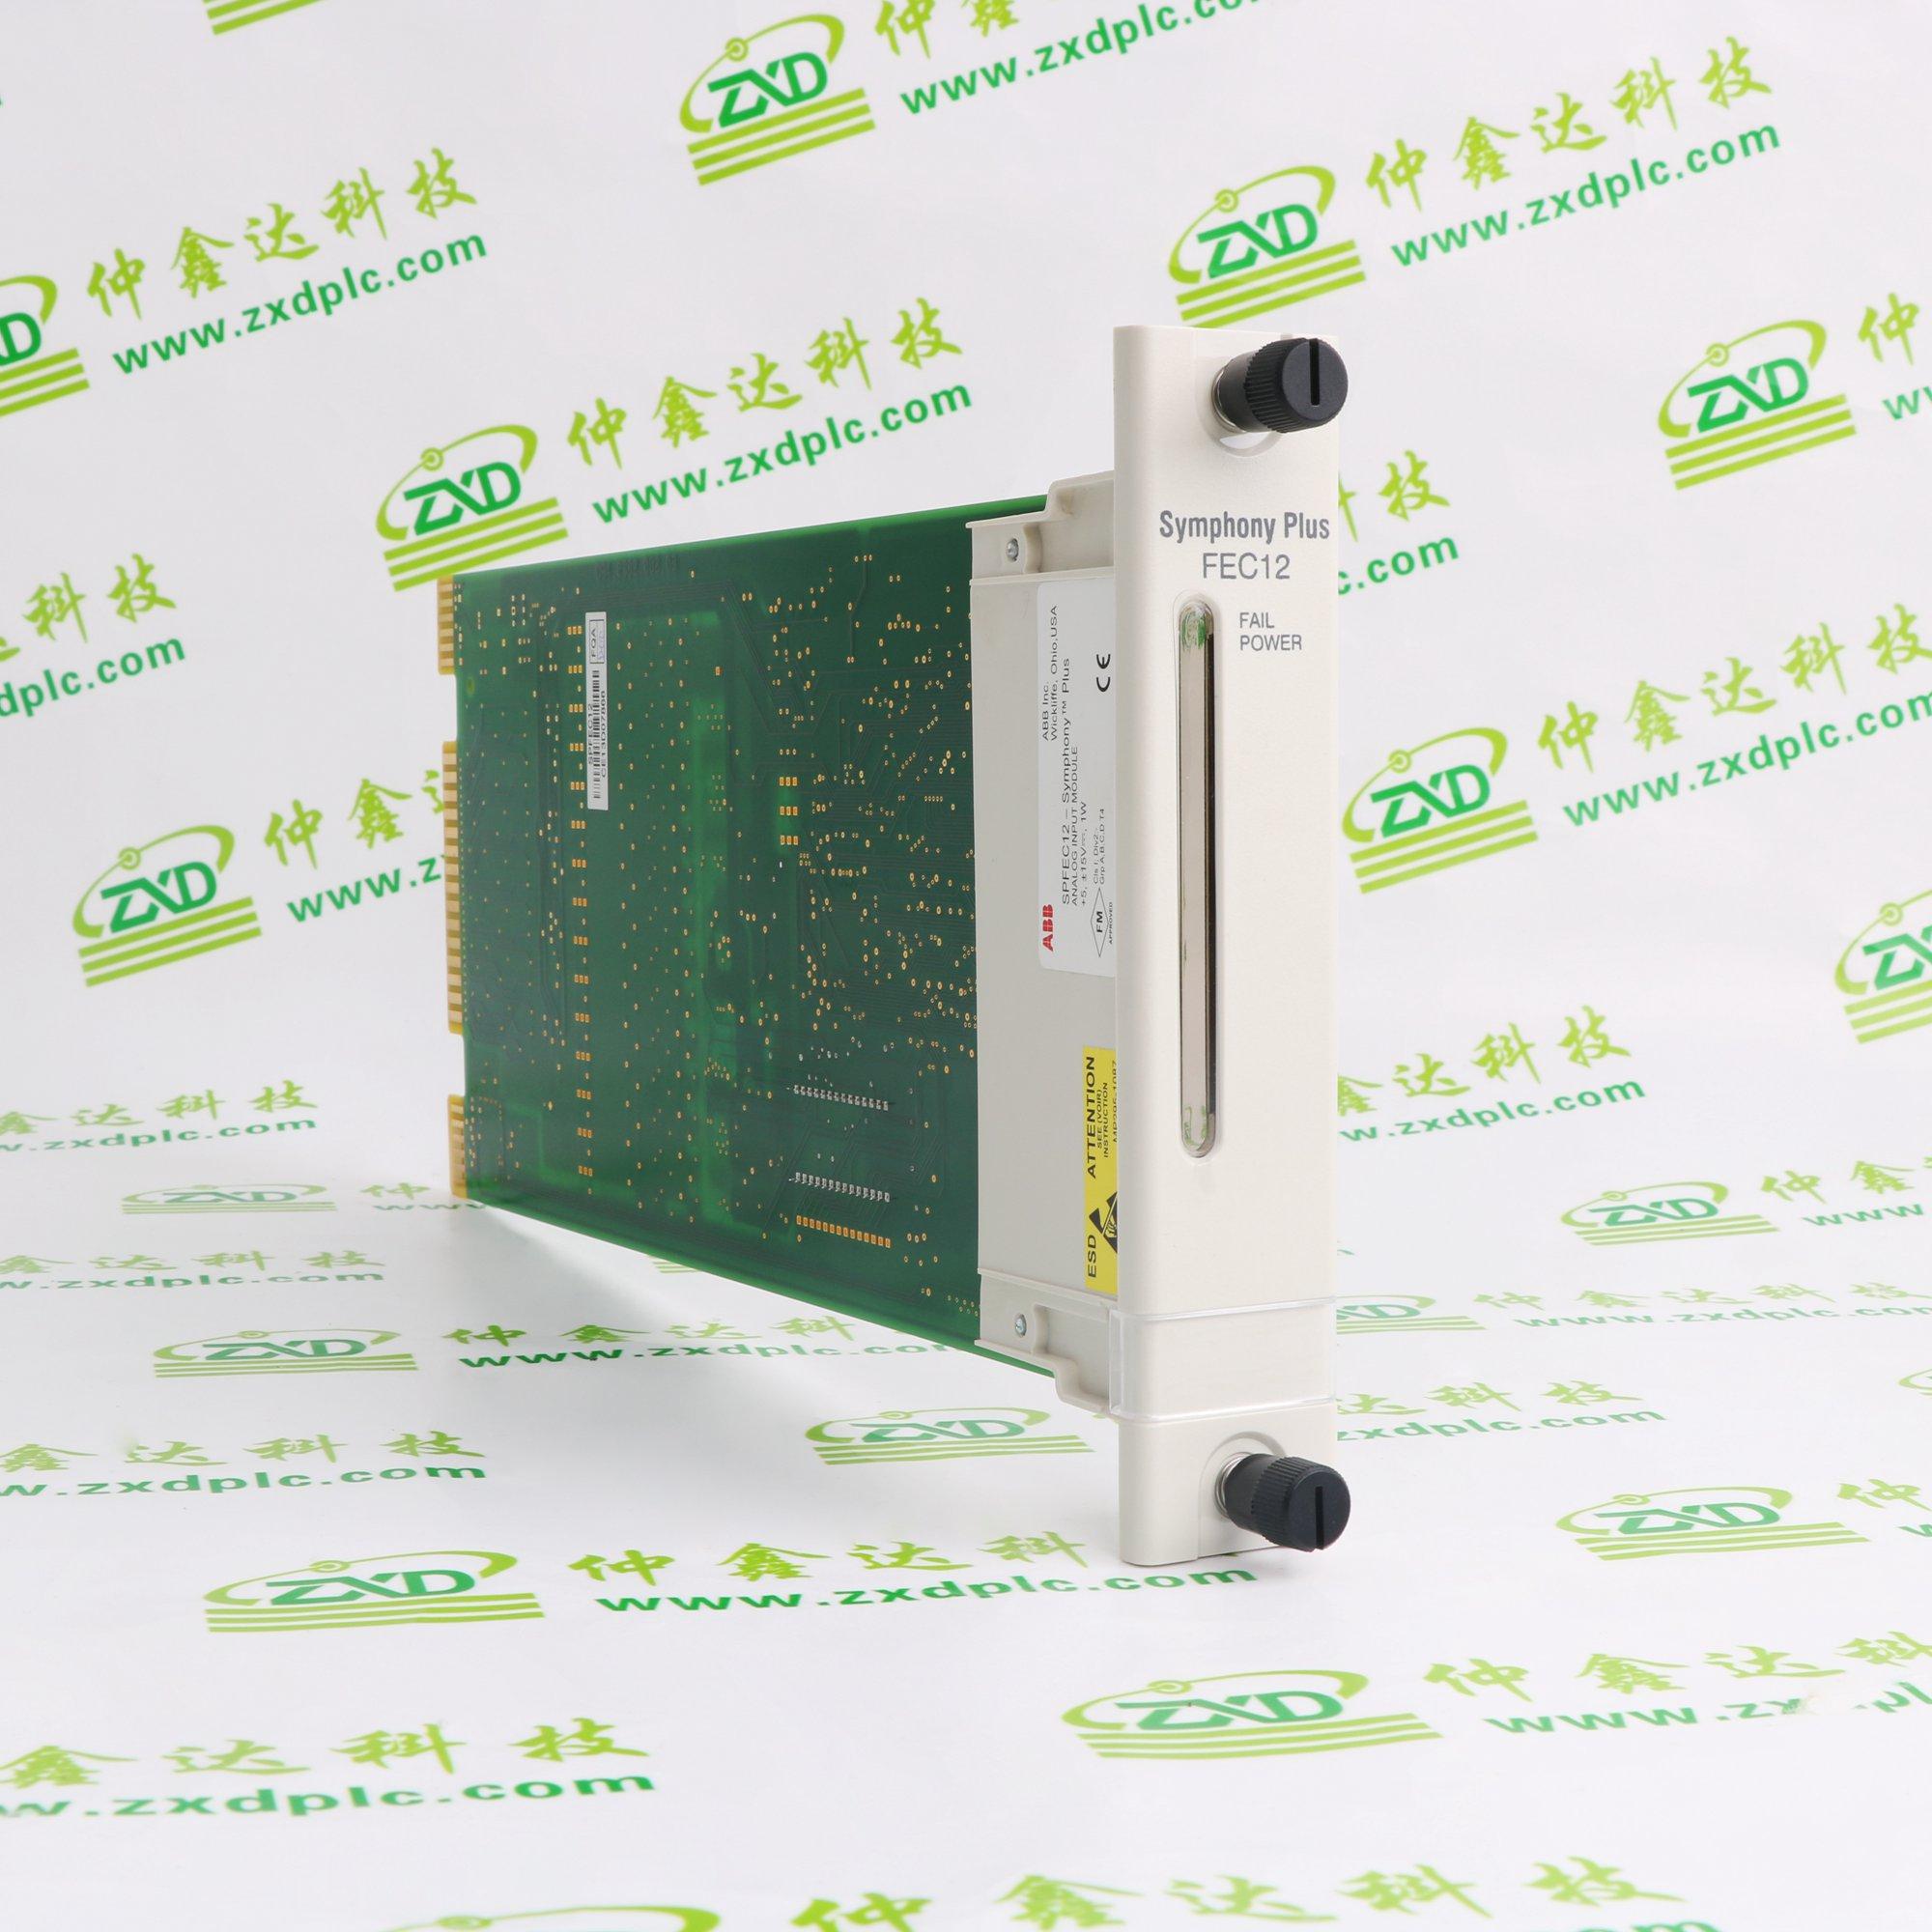 6SY7000-0AA80/R2E190-AE77-B3